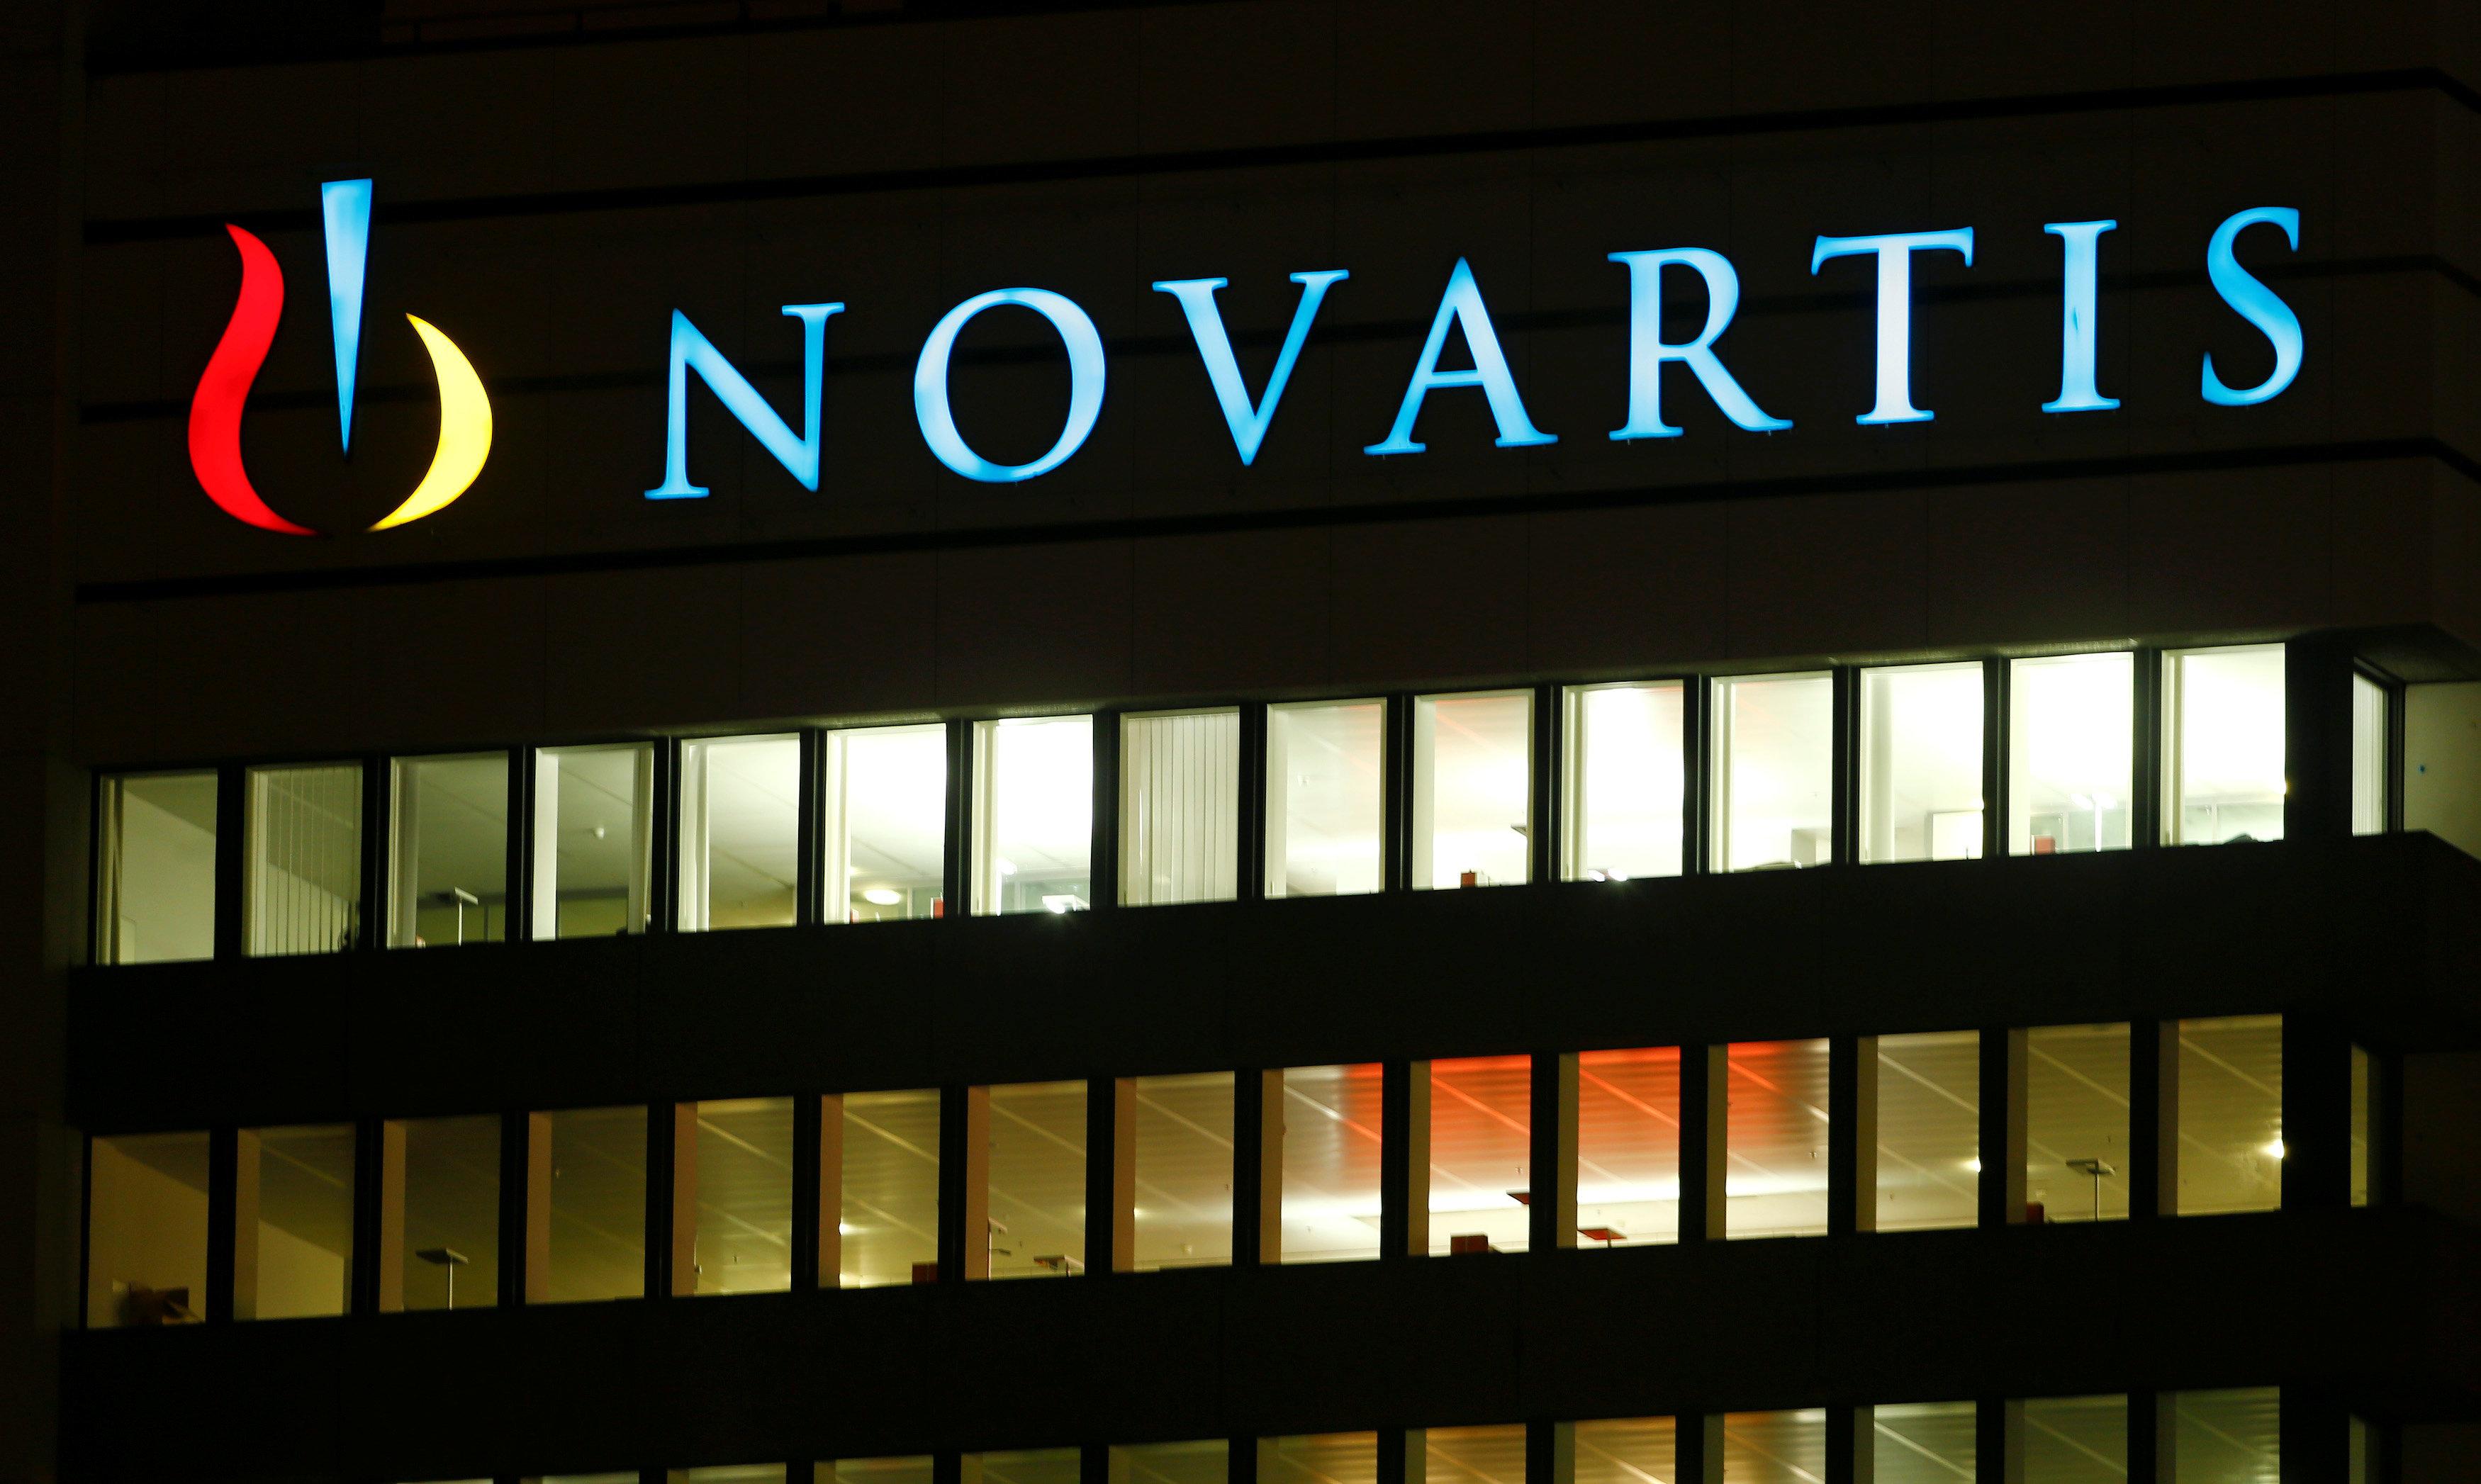 The logo of Swiss drugmaker Novartis AG is seen at its headquarters in Basel, Switzerland January 25, 2017. REUTERS/Arnd Wiegmann